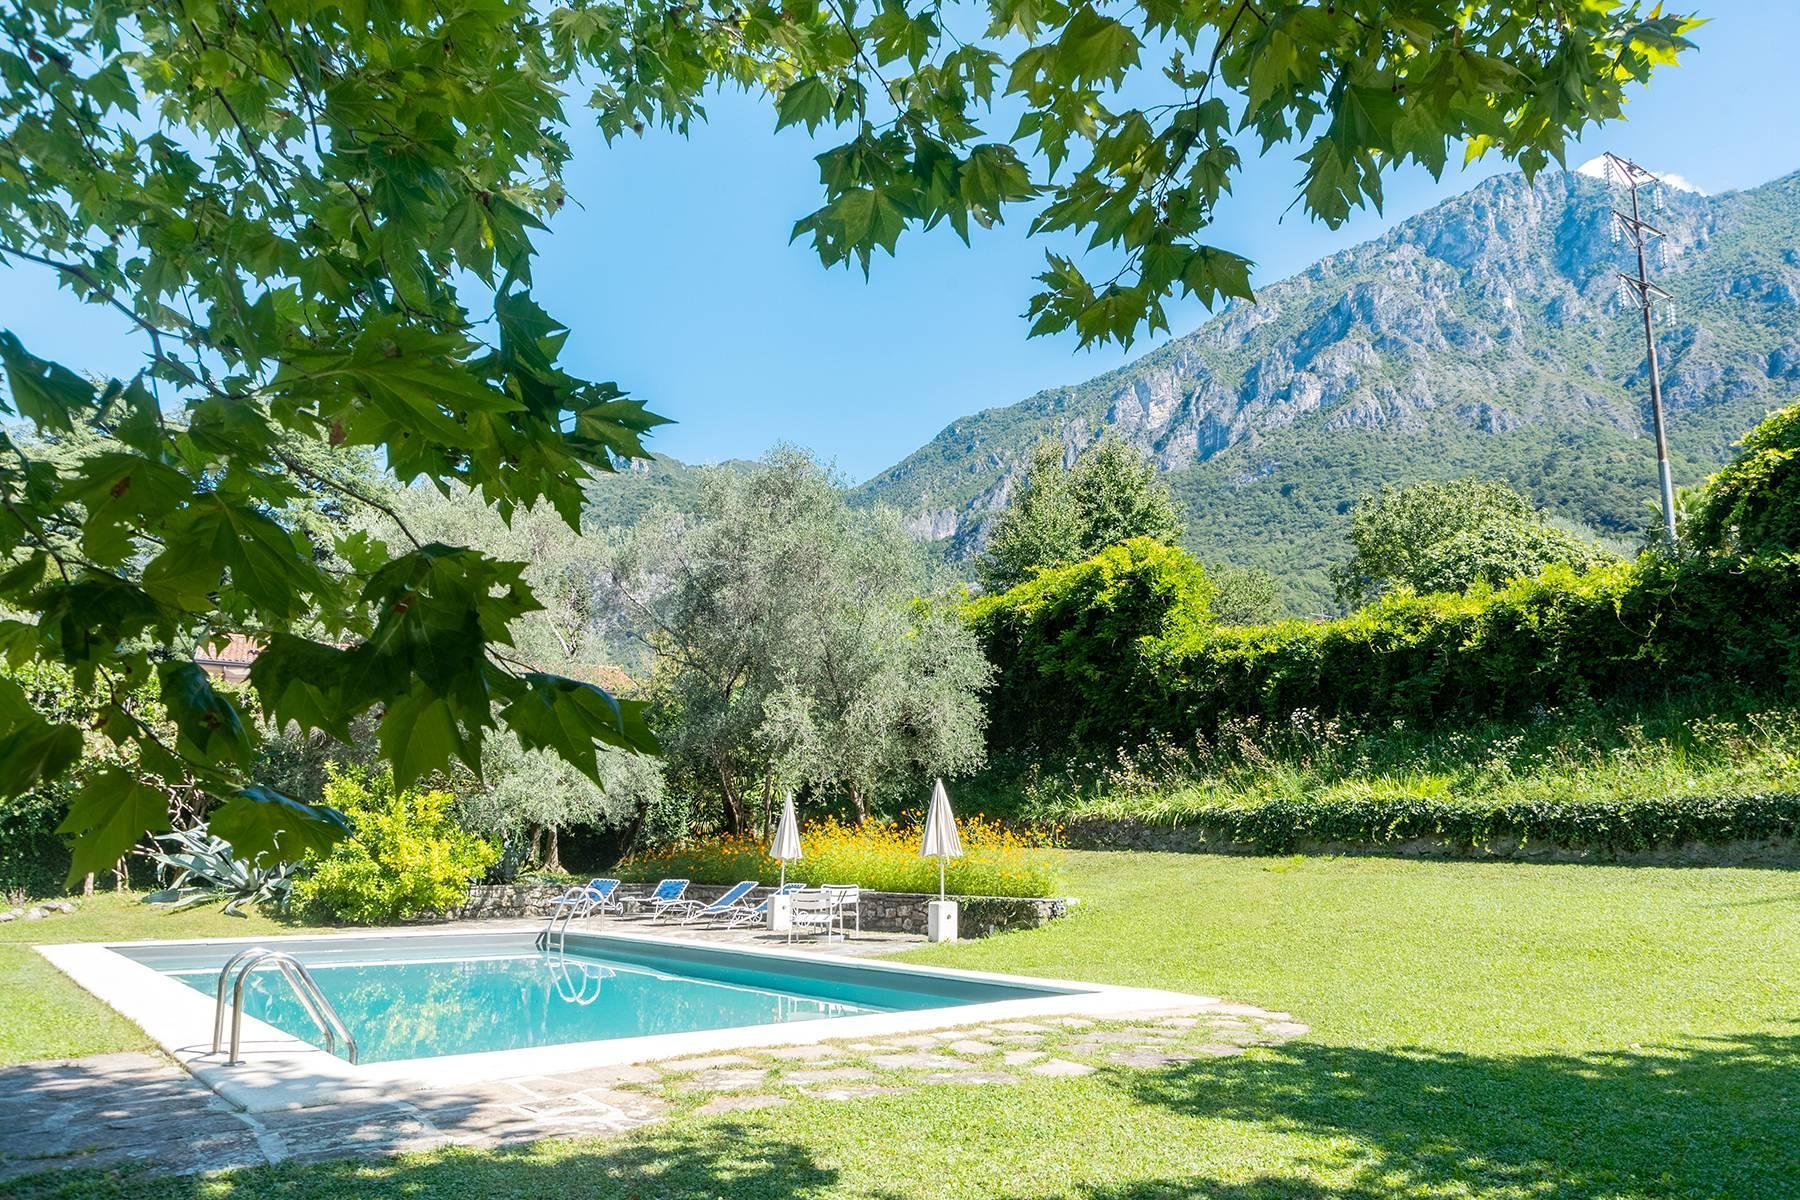 Splendida villa d'epoca con vista lago mozzafiato - 11